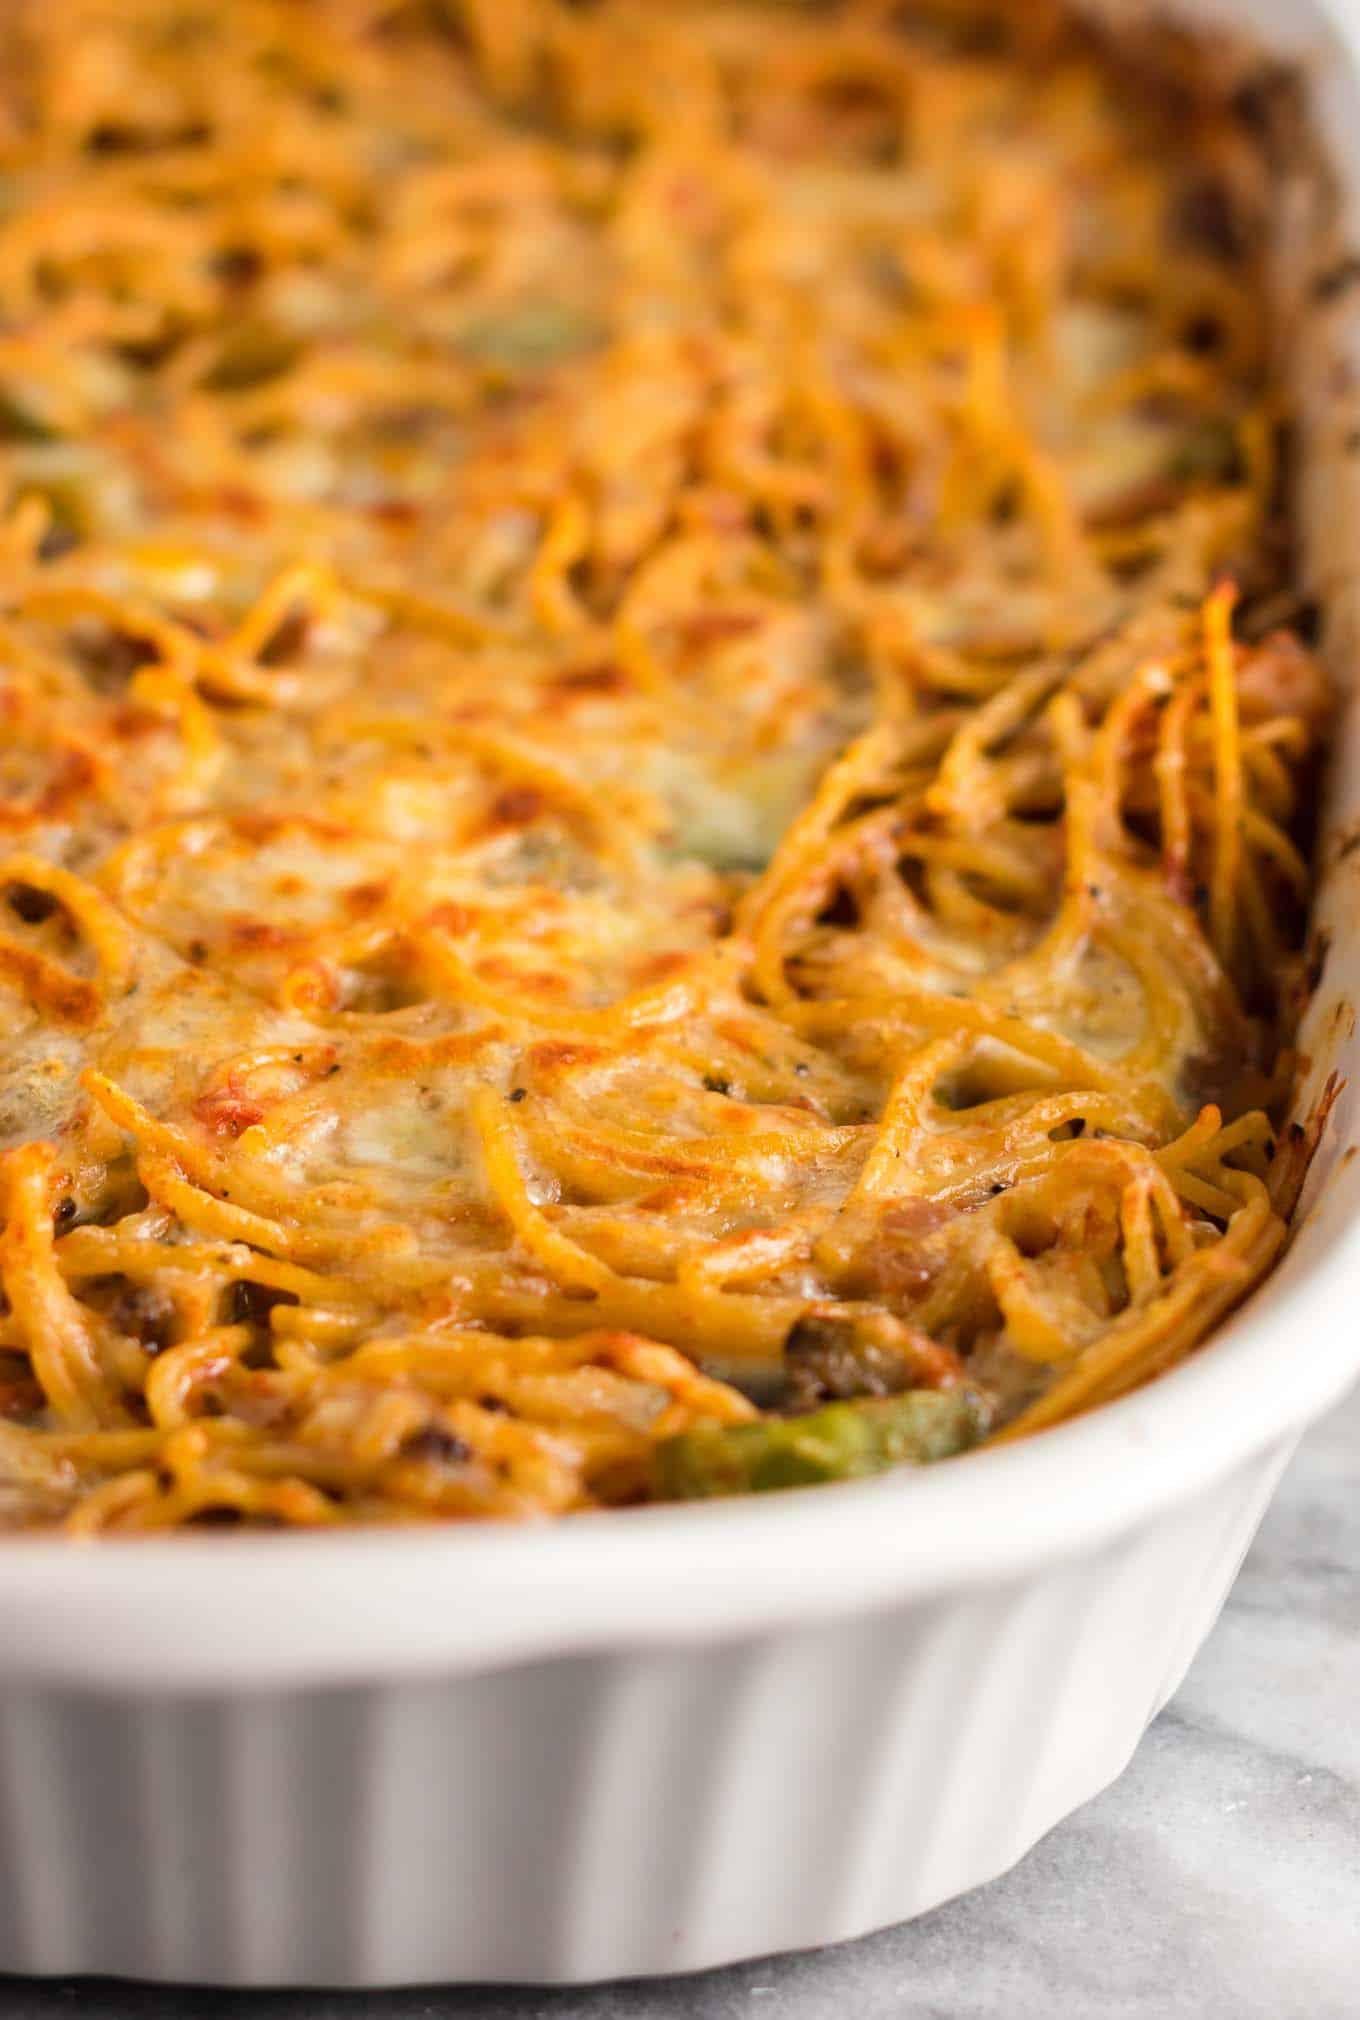 baked spaghetti in a casserole dish